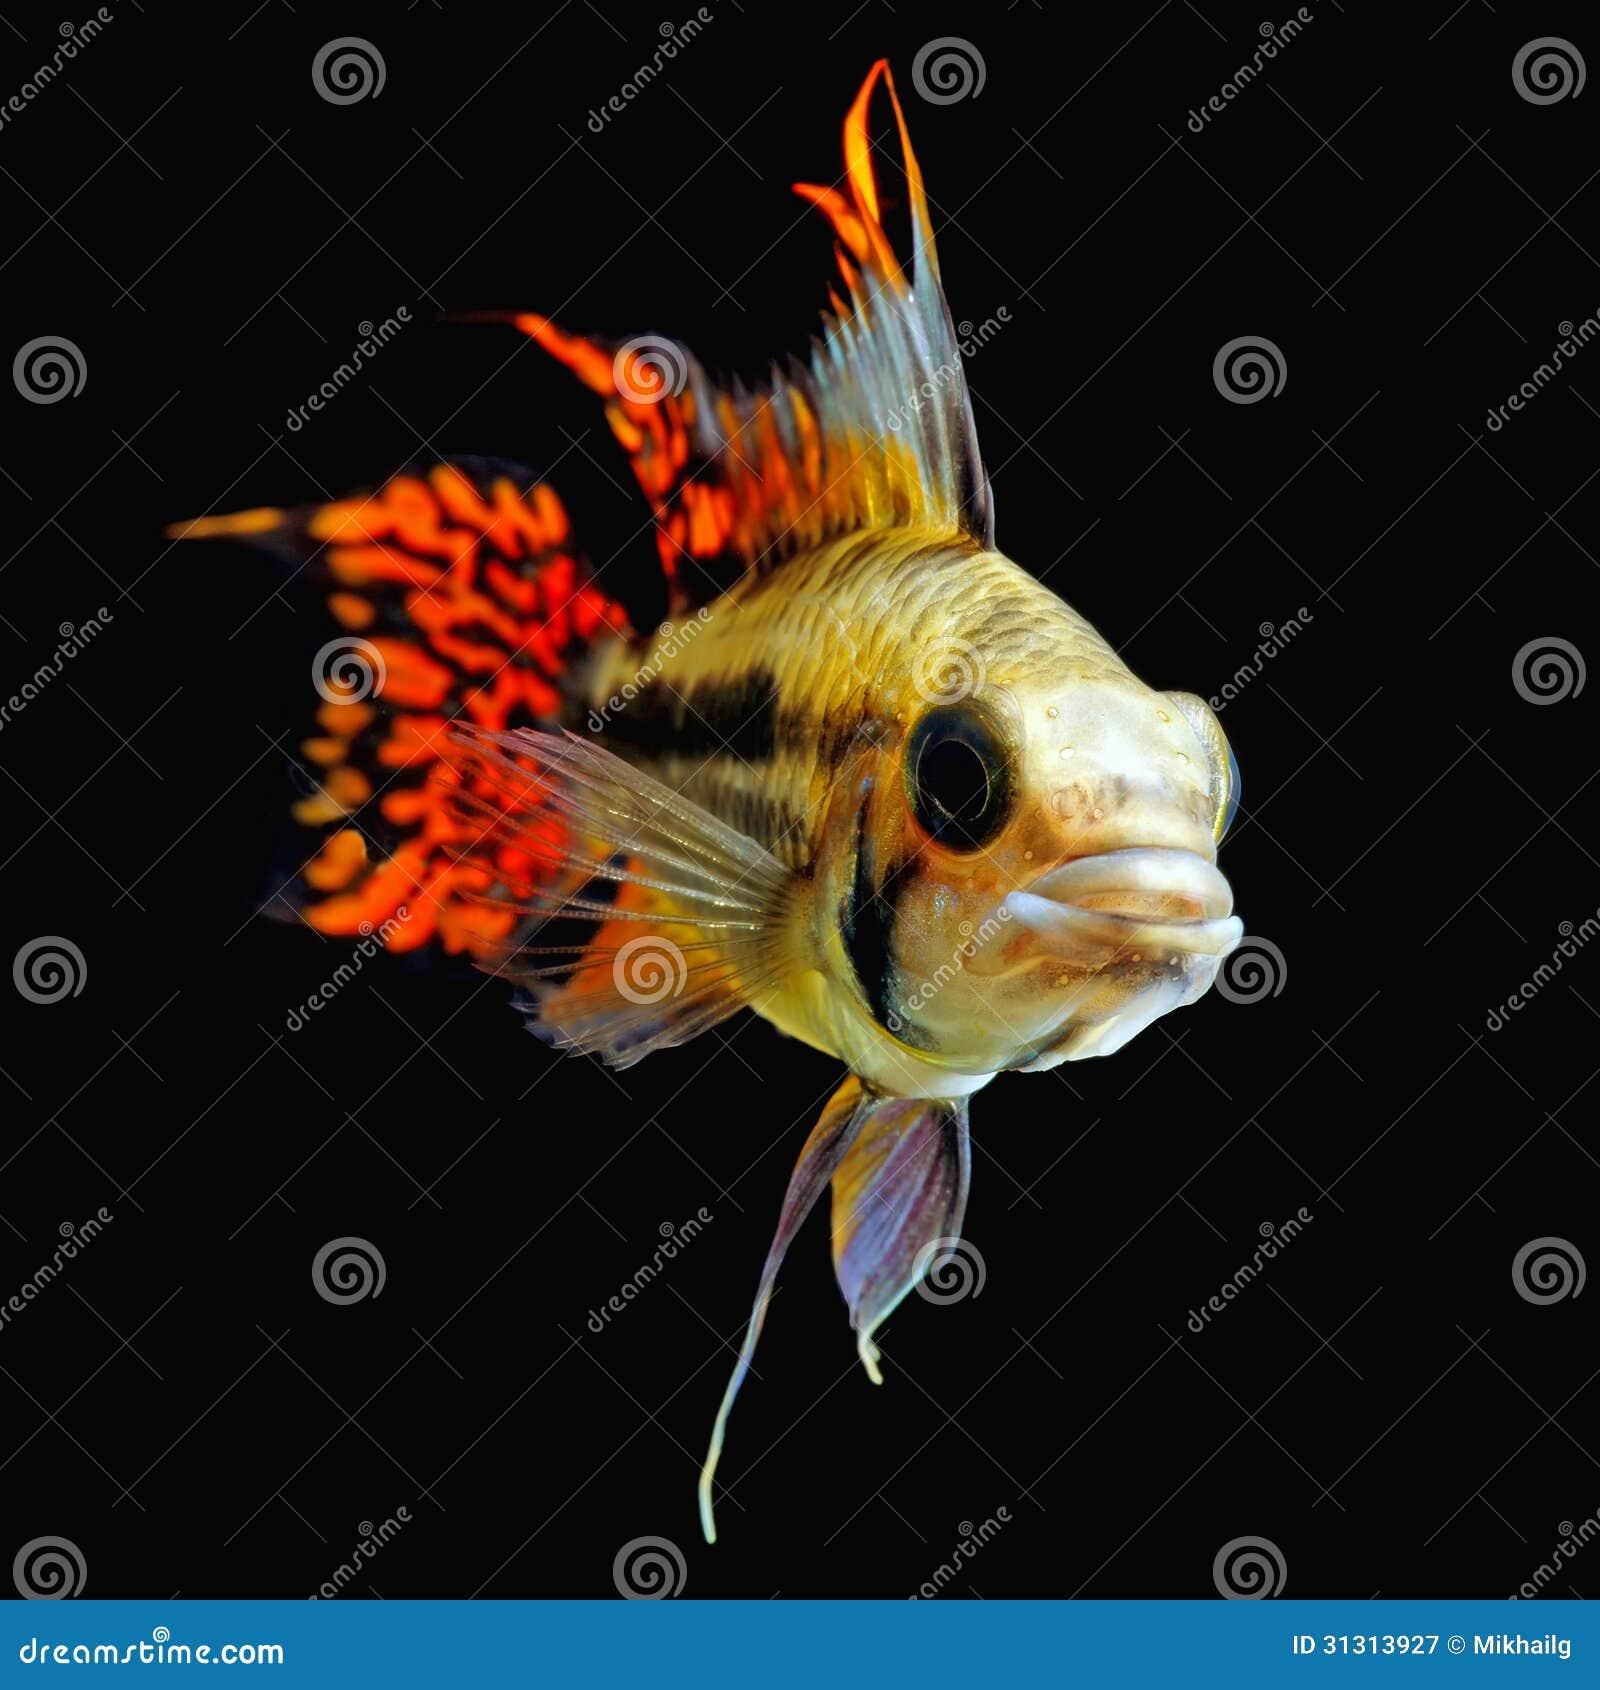 Freshwater aquarium fish cichlids - Cockatoo Dwarf Cichlid Royalty Free Stock Photography